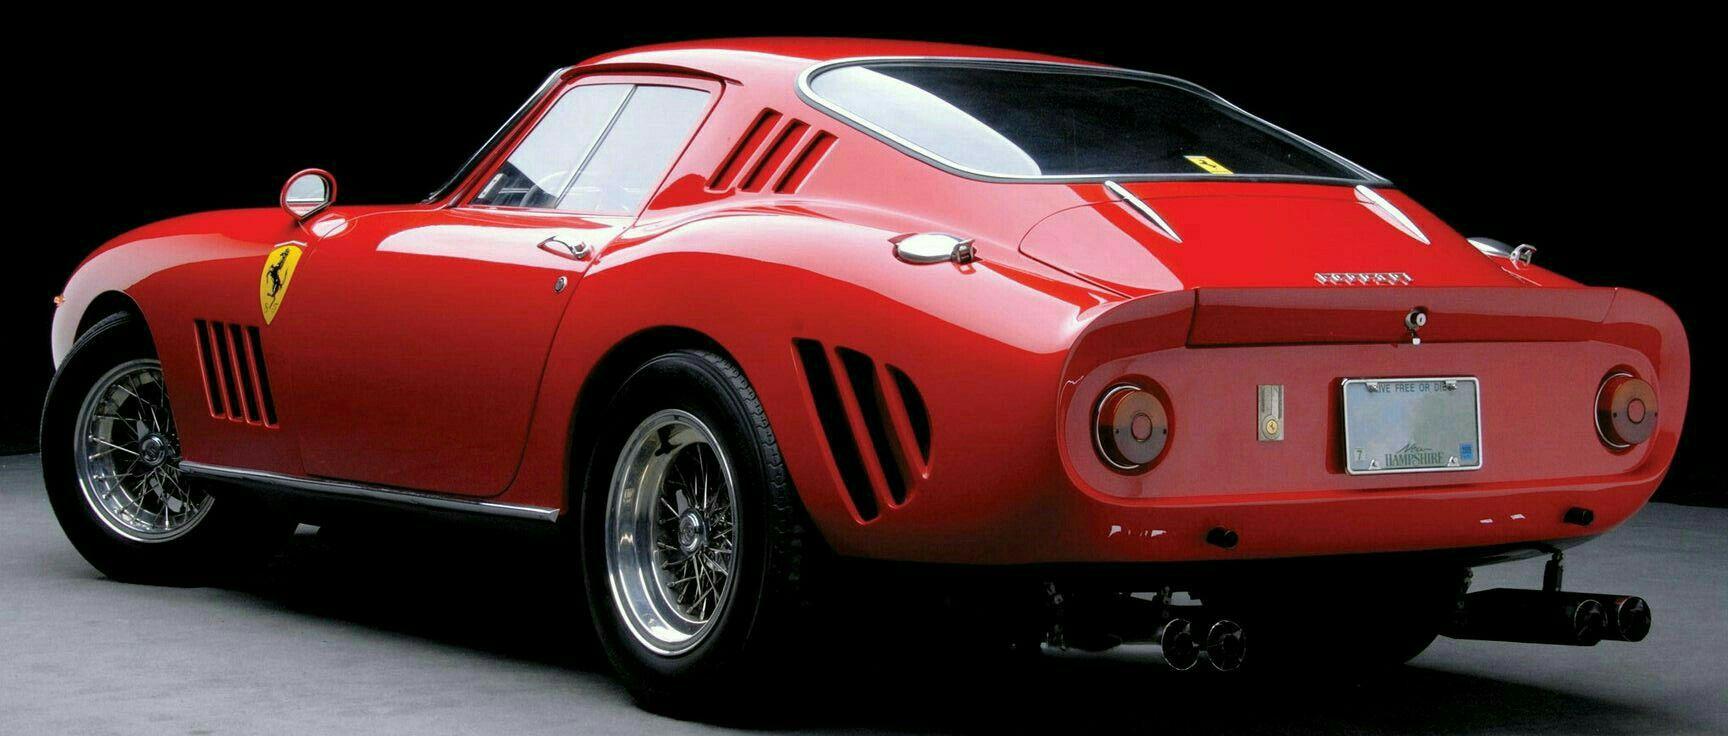 Pin By Douglas Rodrigo Finkler On Automobilismo Ferrari Red Car